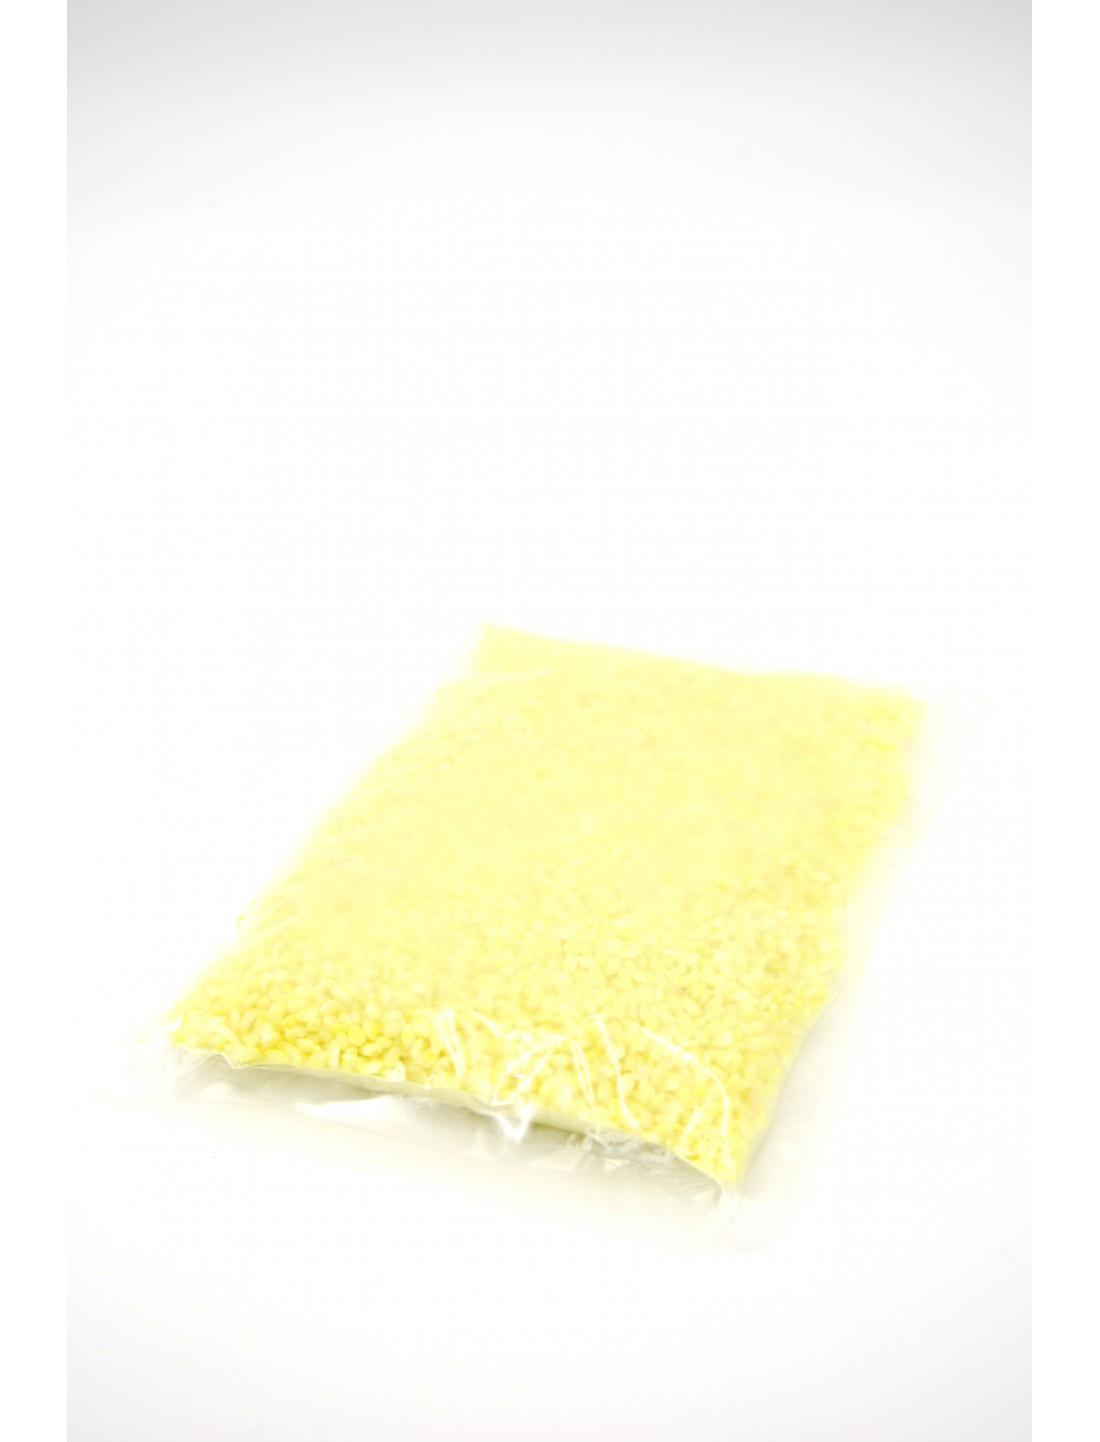 Base sensorial fluorescente amarilla....